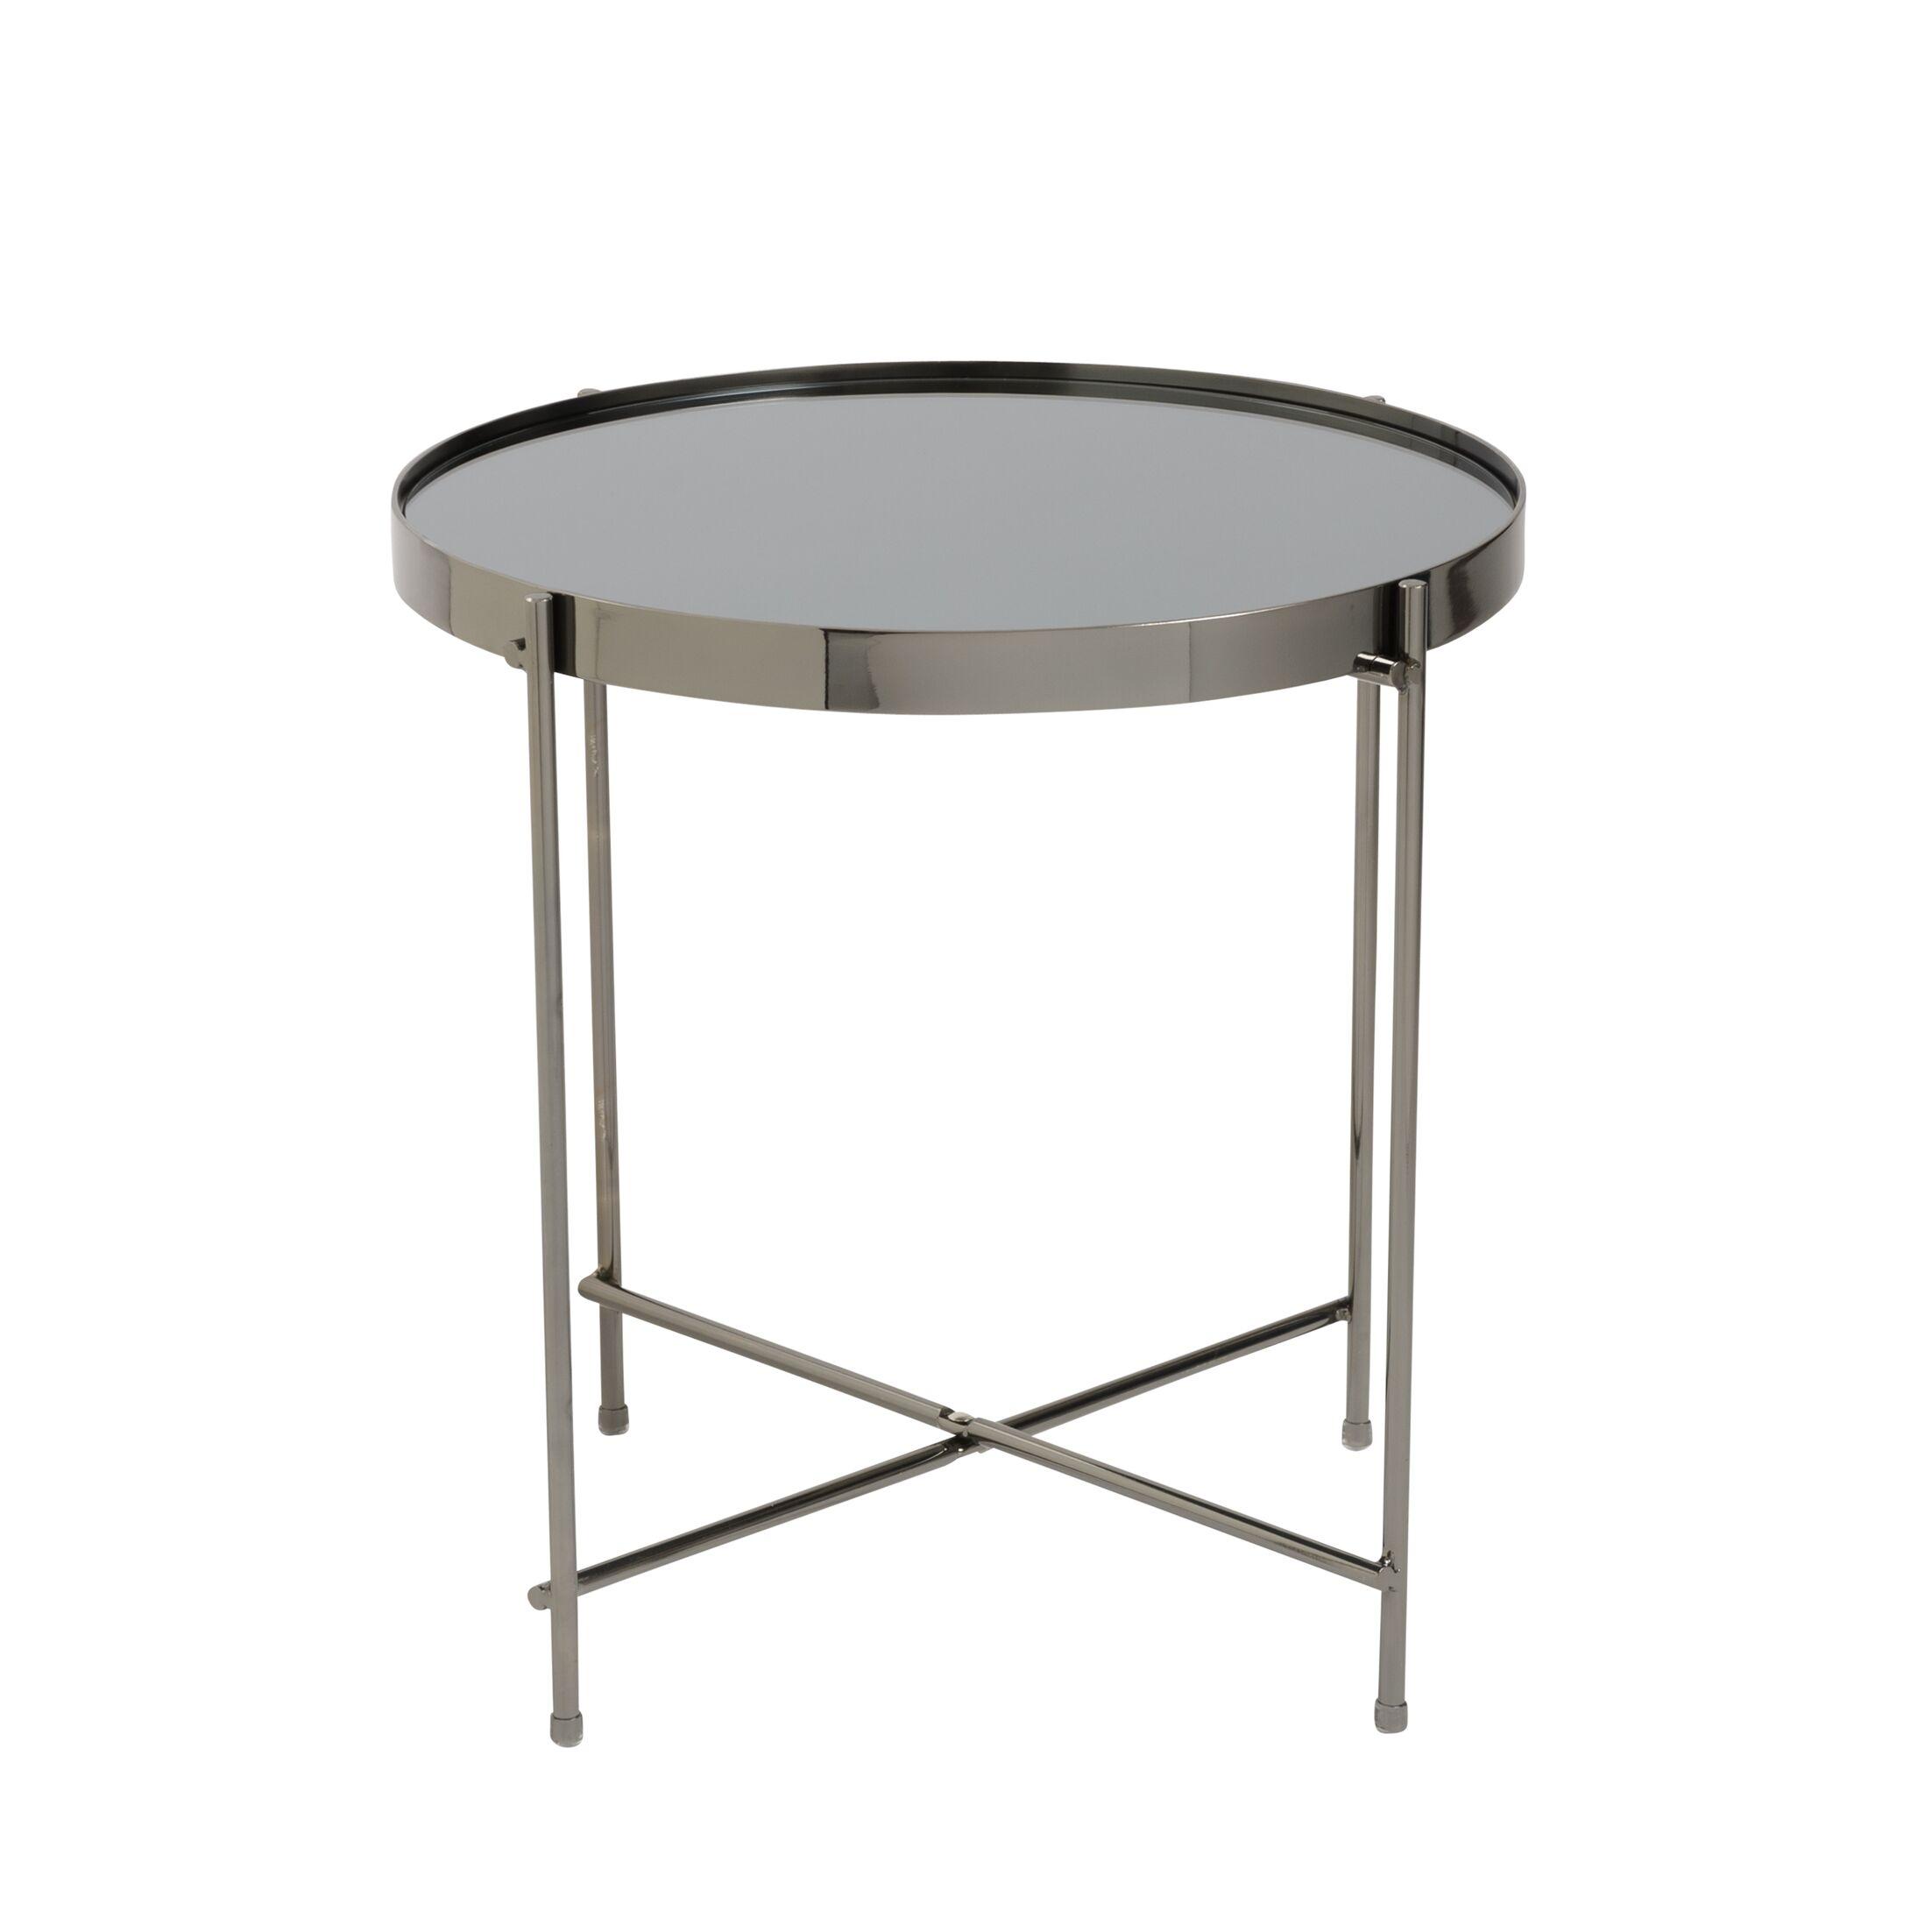 Blalock End Table Color: Black